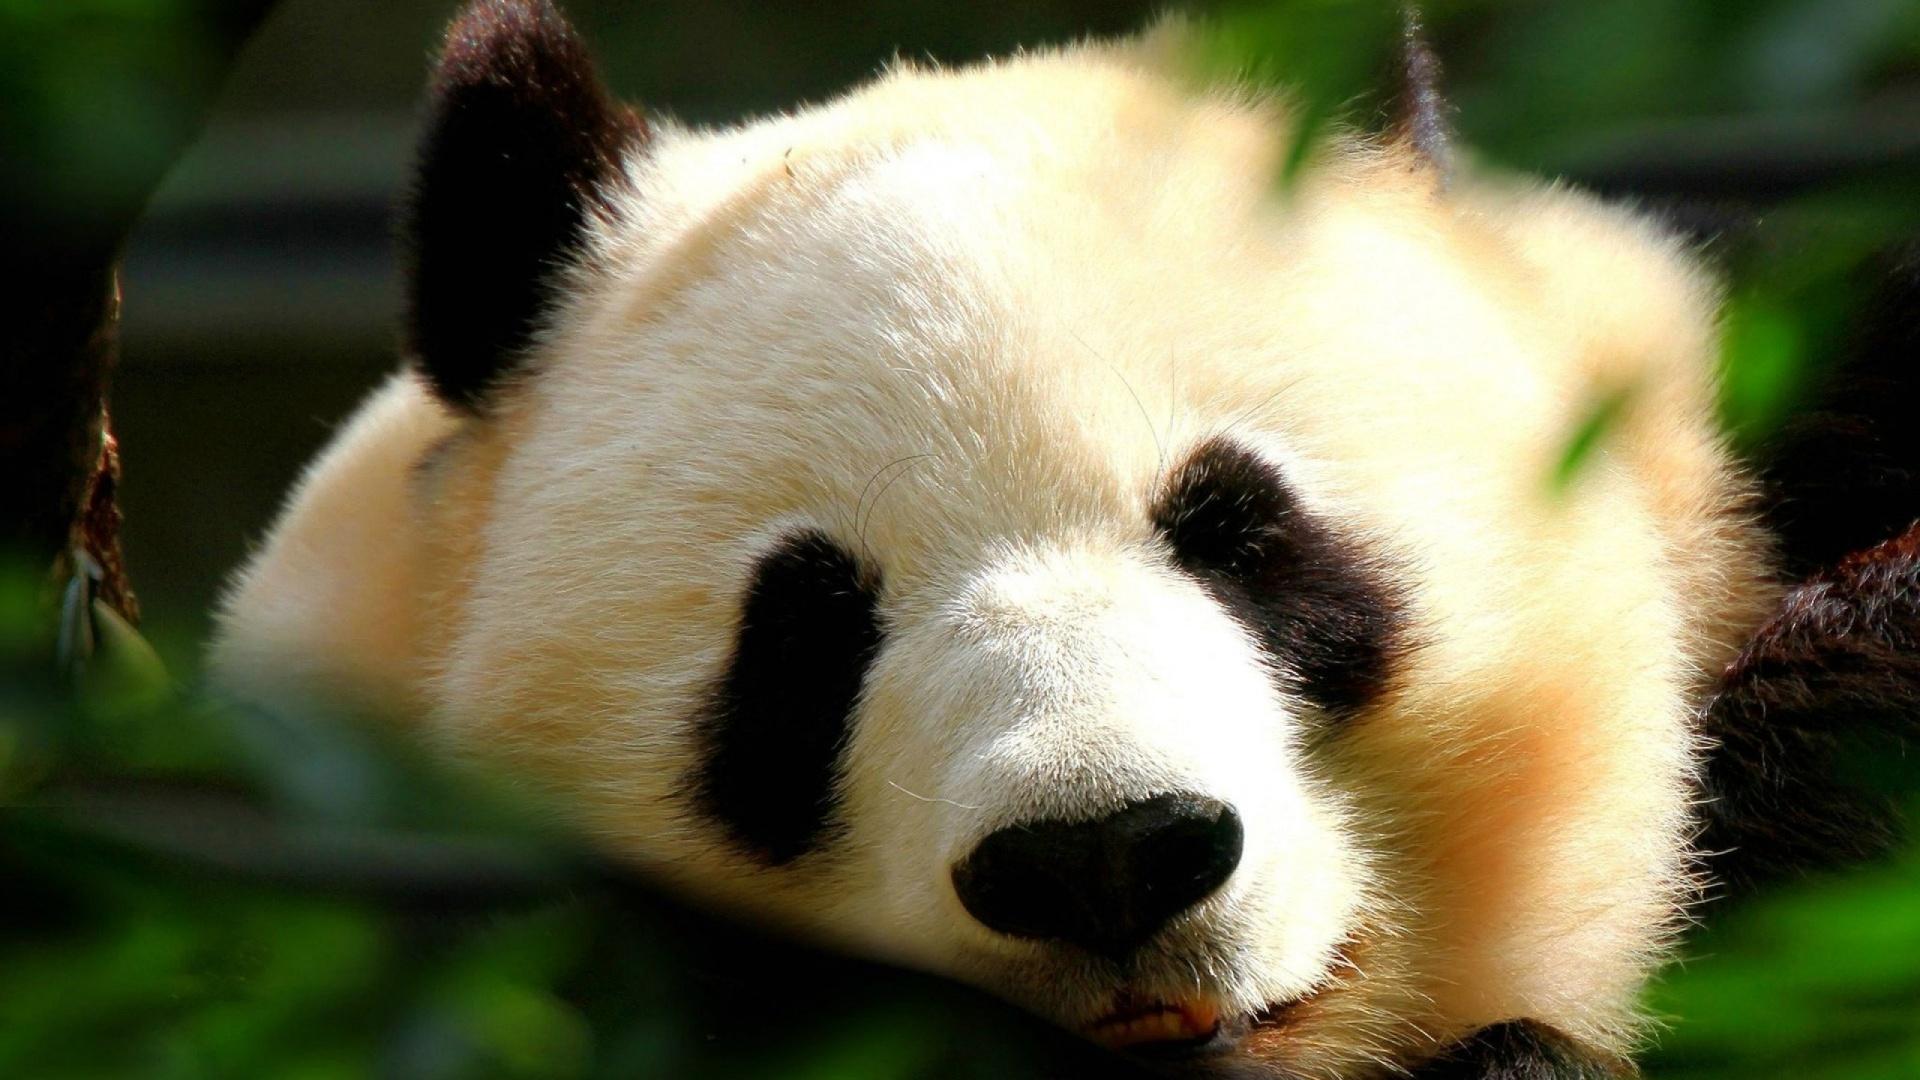 Cute Panda Wallpaper 15783 1920x1080 px HDWallSourcecom 1920x1080